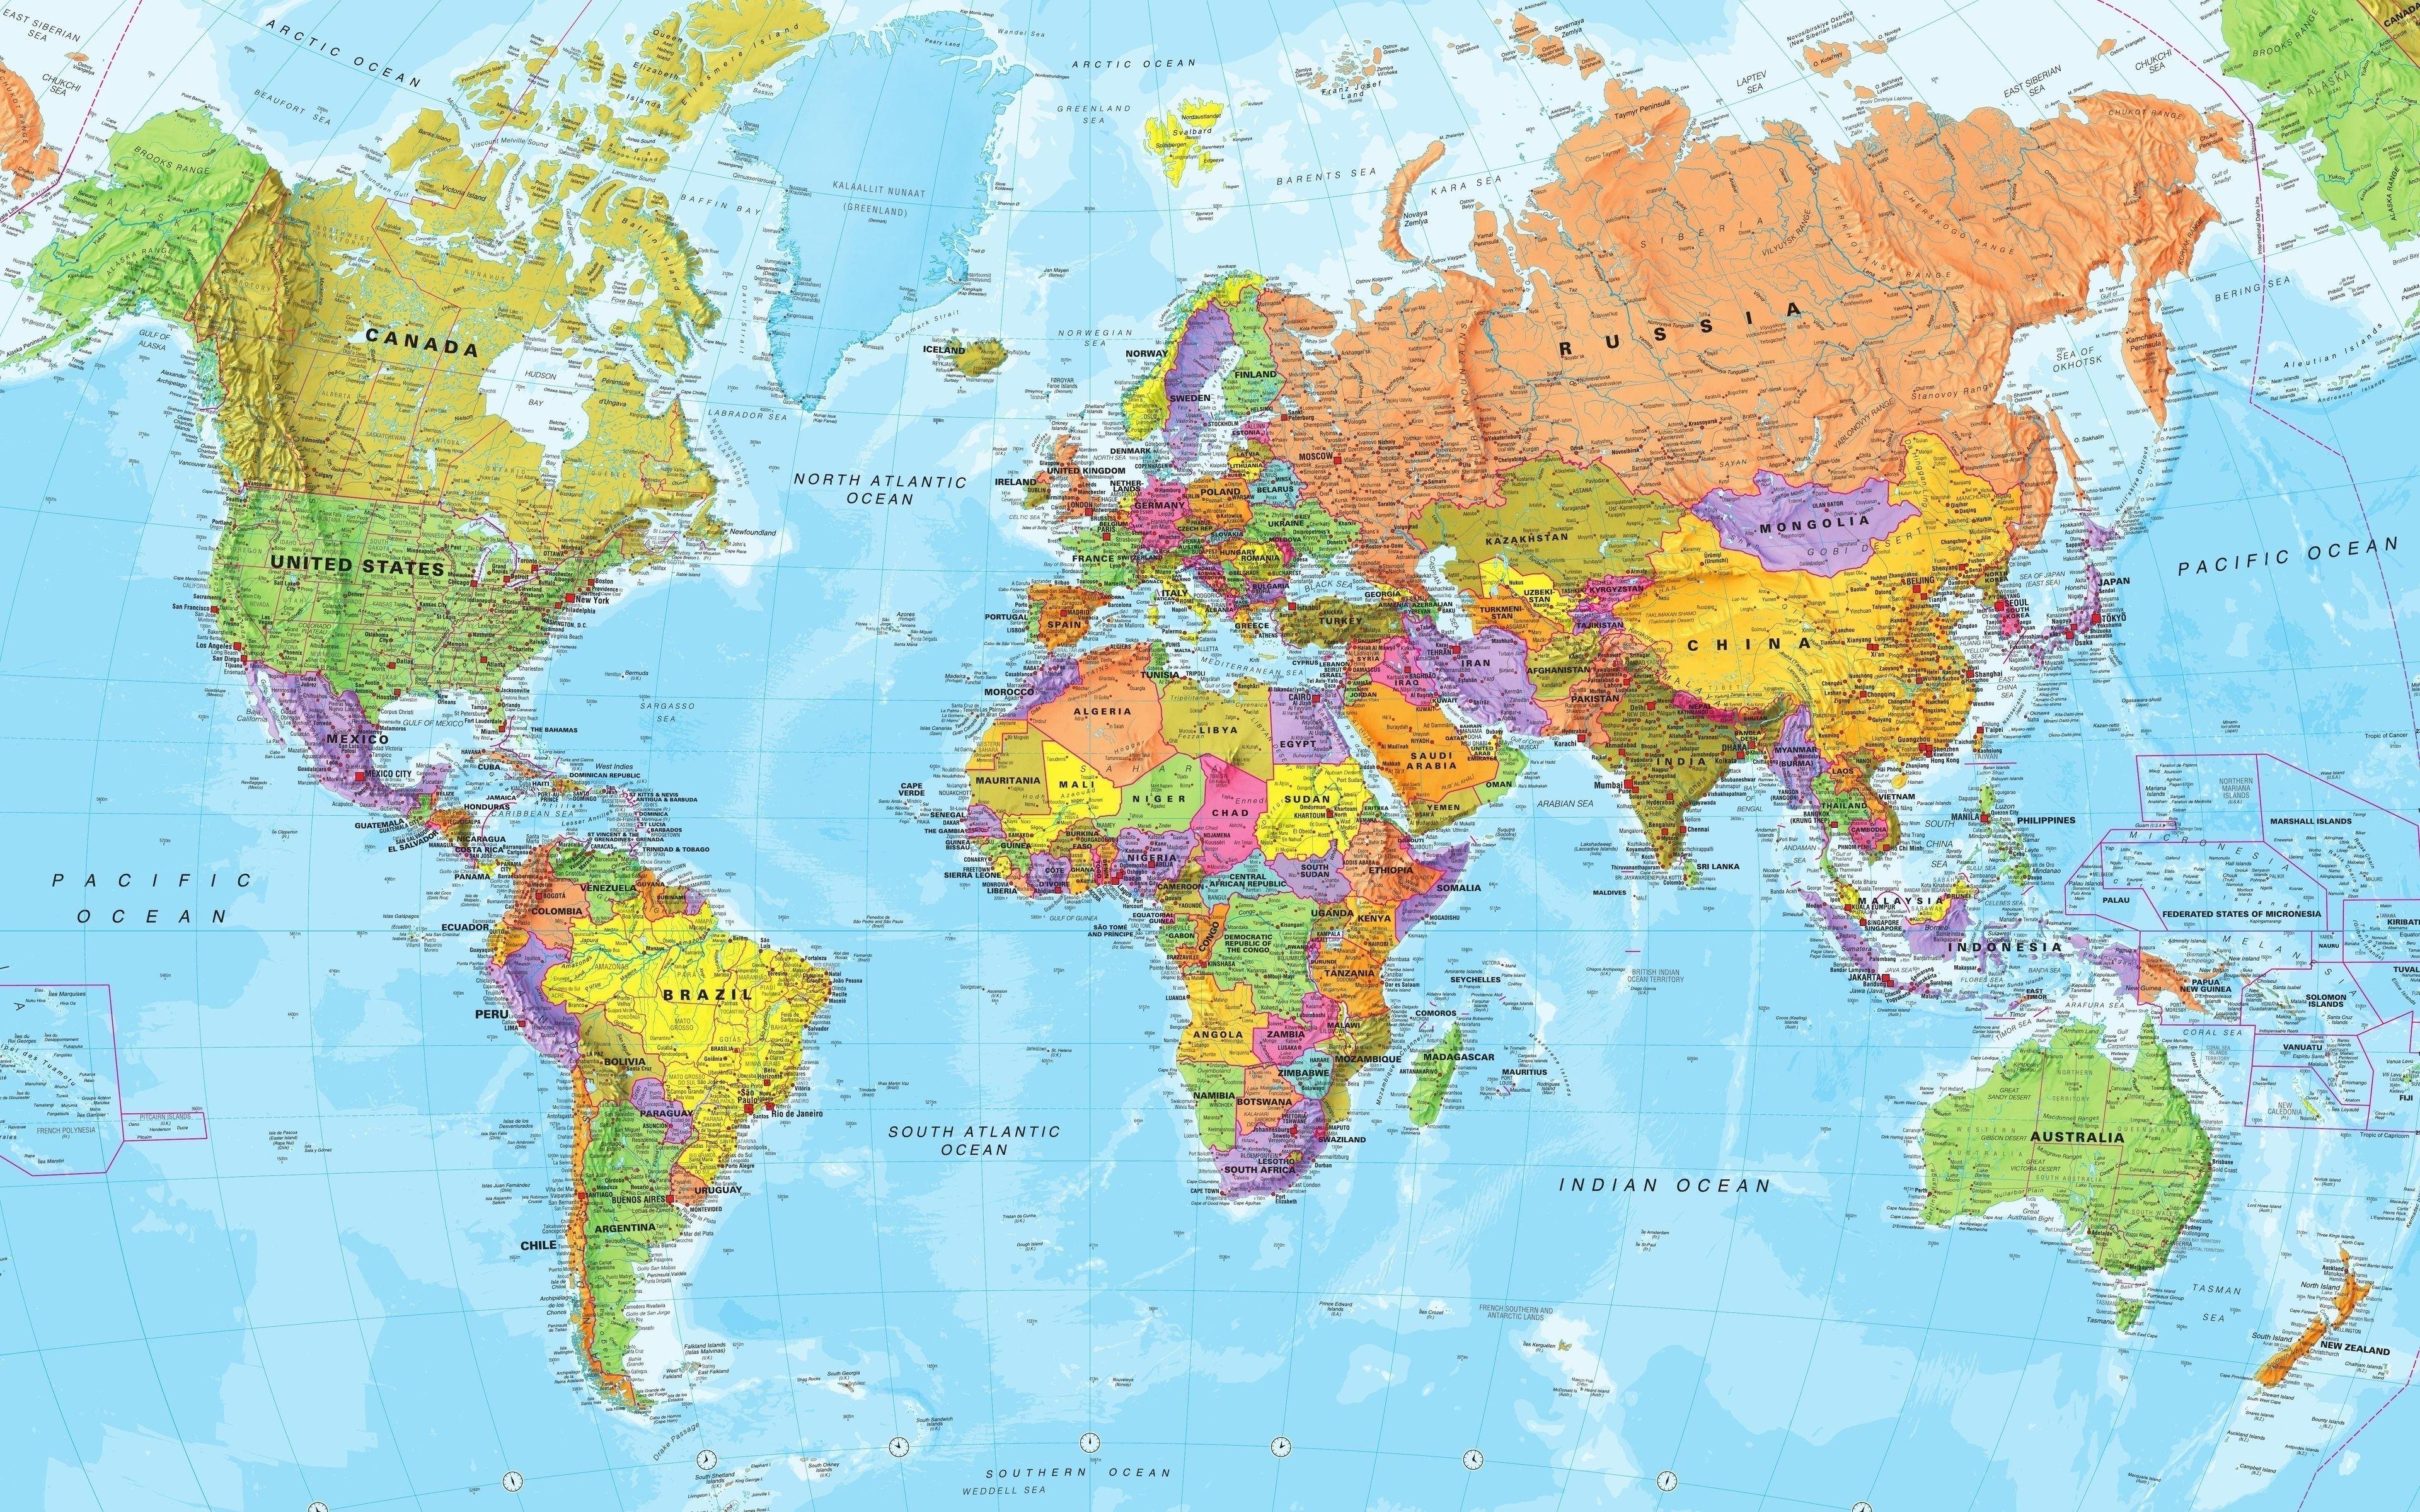 Mapa Del Mundo Mapa Politico 4 Los Paises Del Mundo